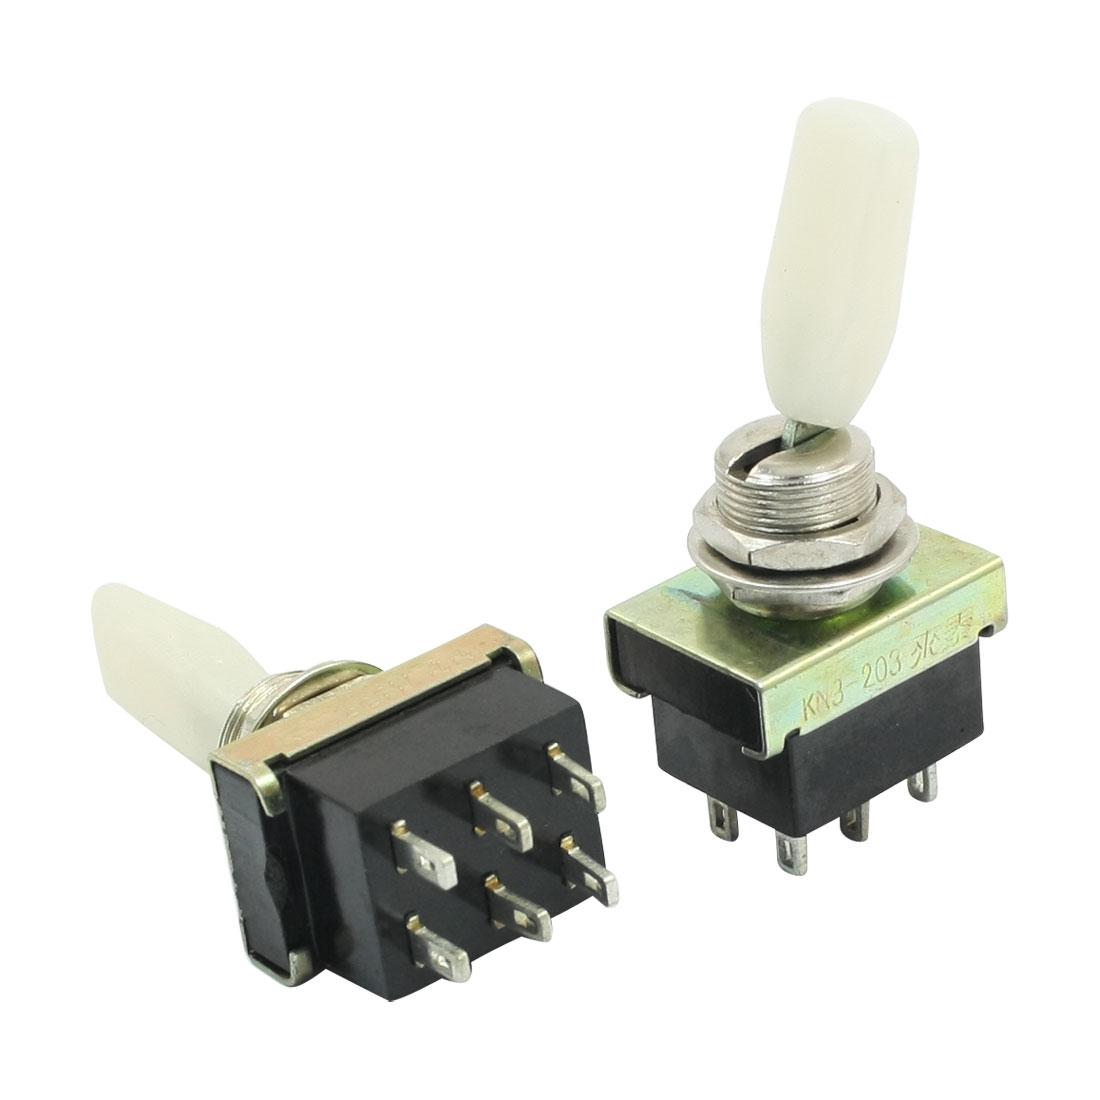 Plastic Rocker 2PDT ON/OFF/OFF 3 Position Toggle Switch AC 220V 3A KN3-203 2pcs